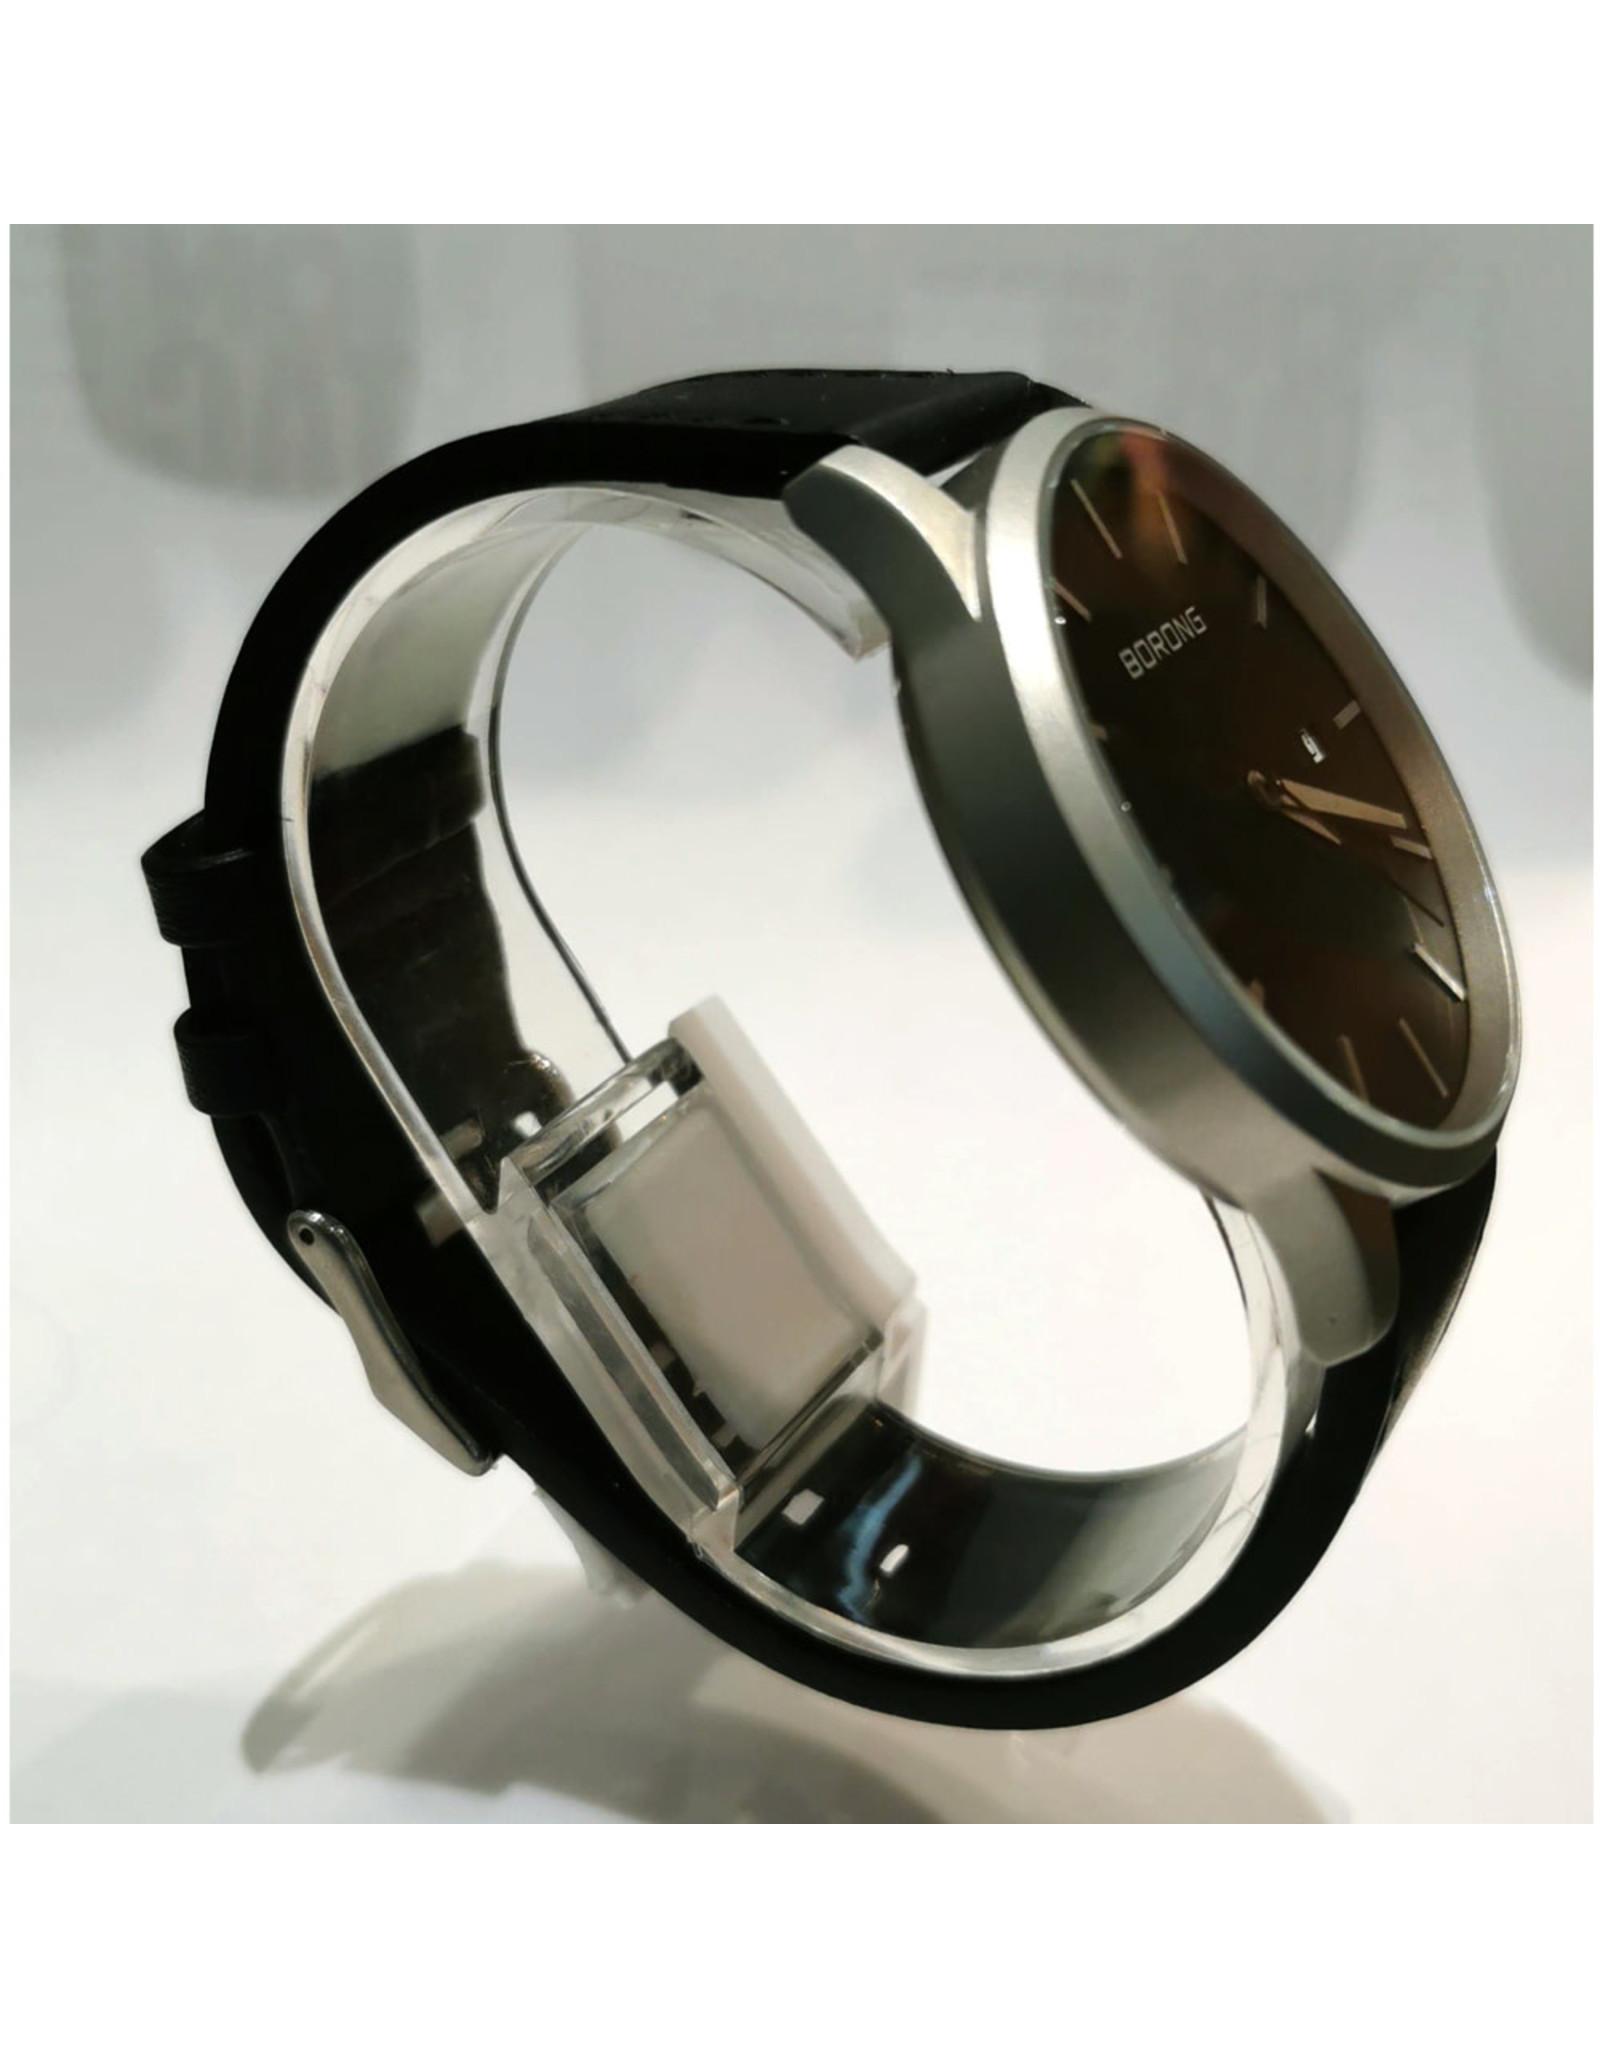 Borong Cuir noir, boîtier argent, fond noir